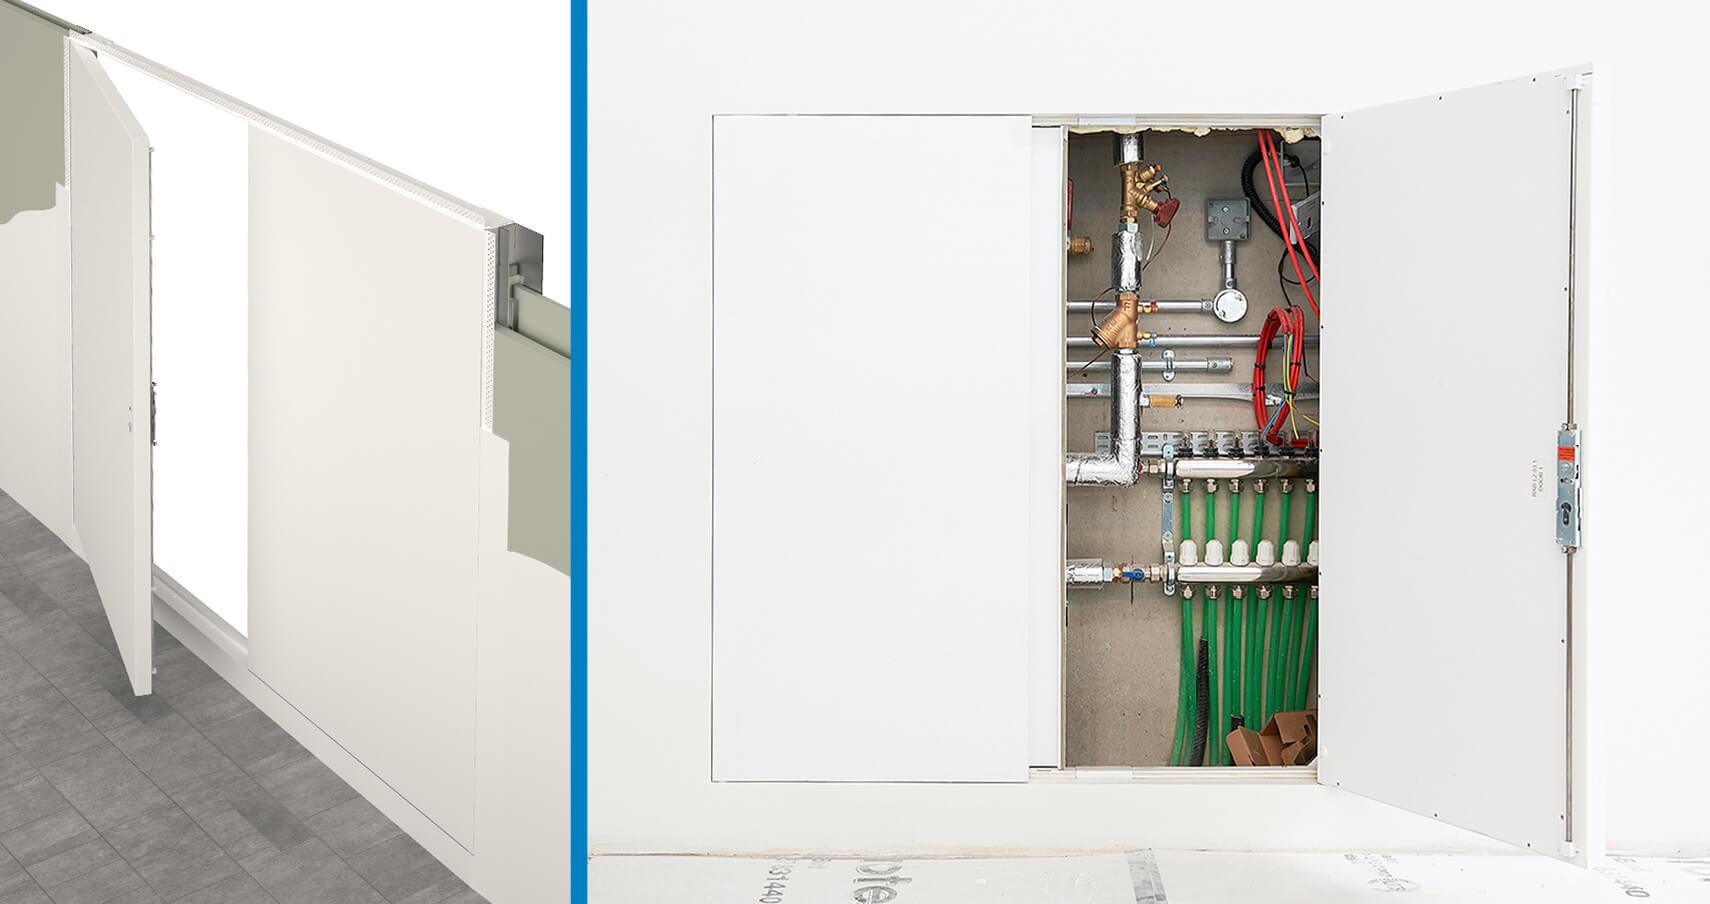 Quadra Riser Door System Technical Specifications